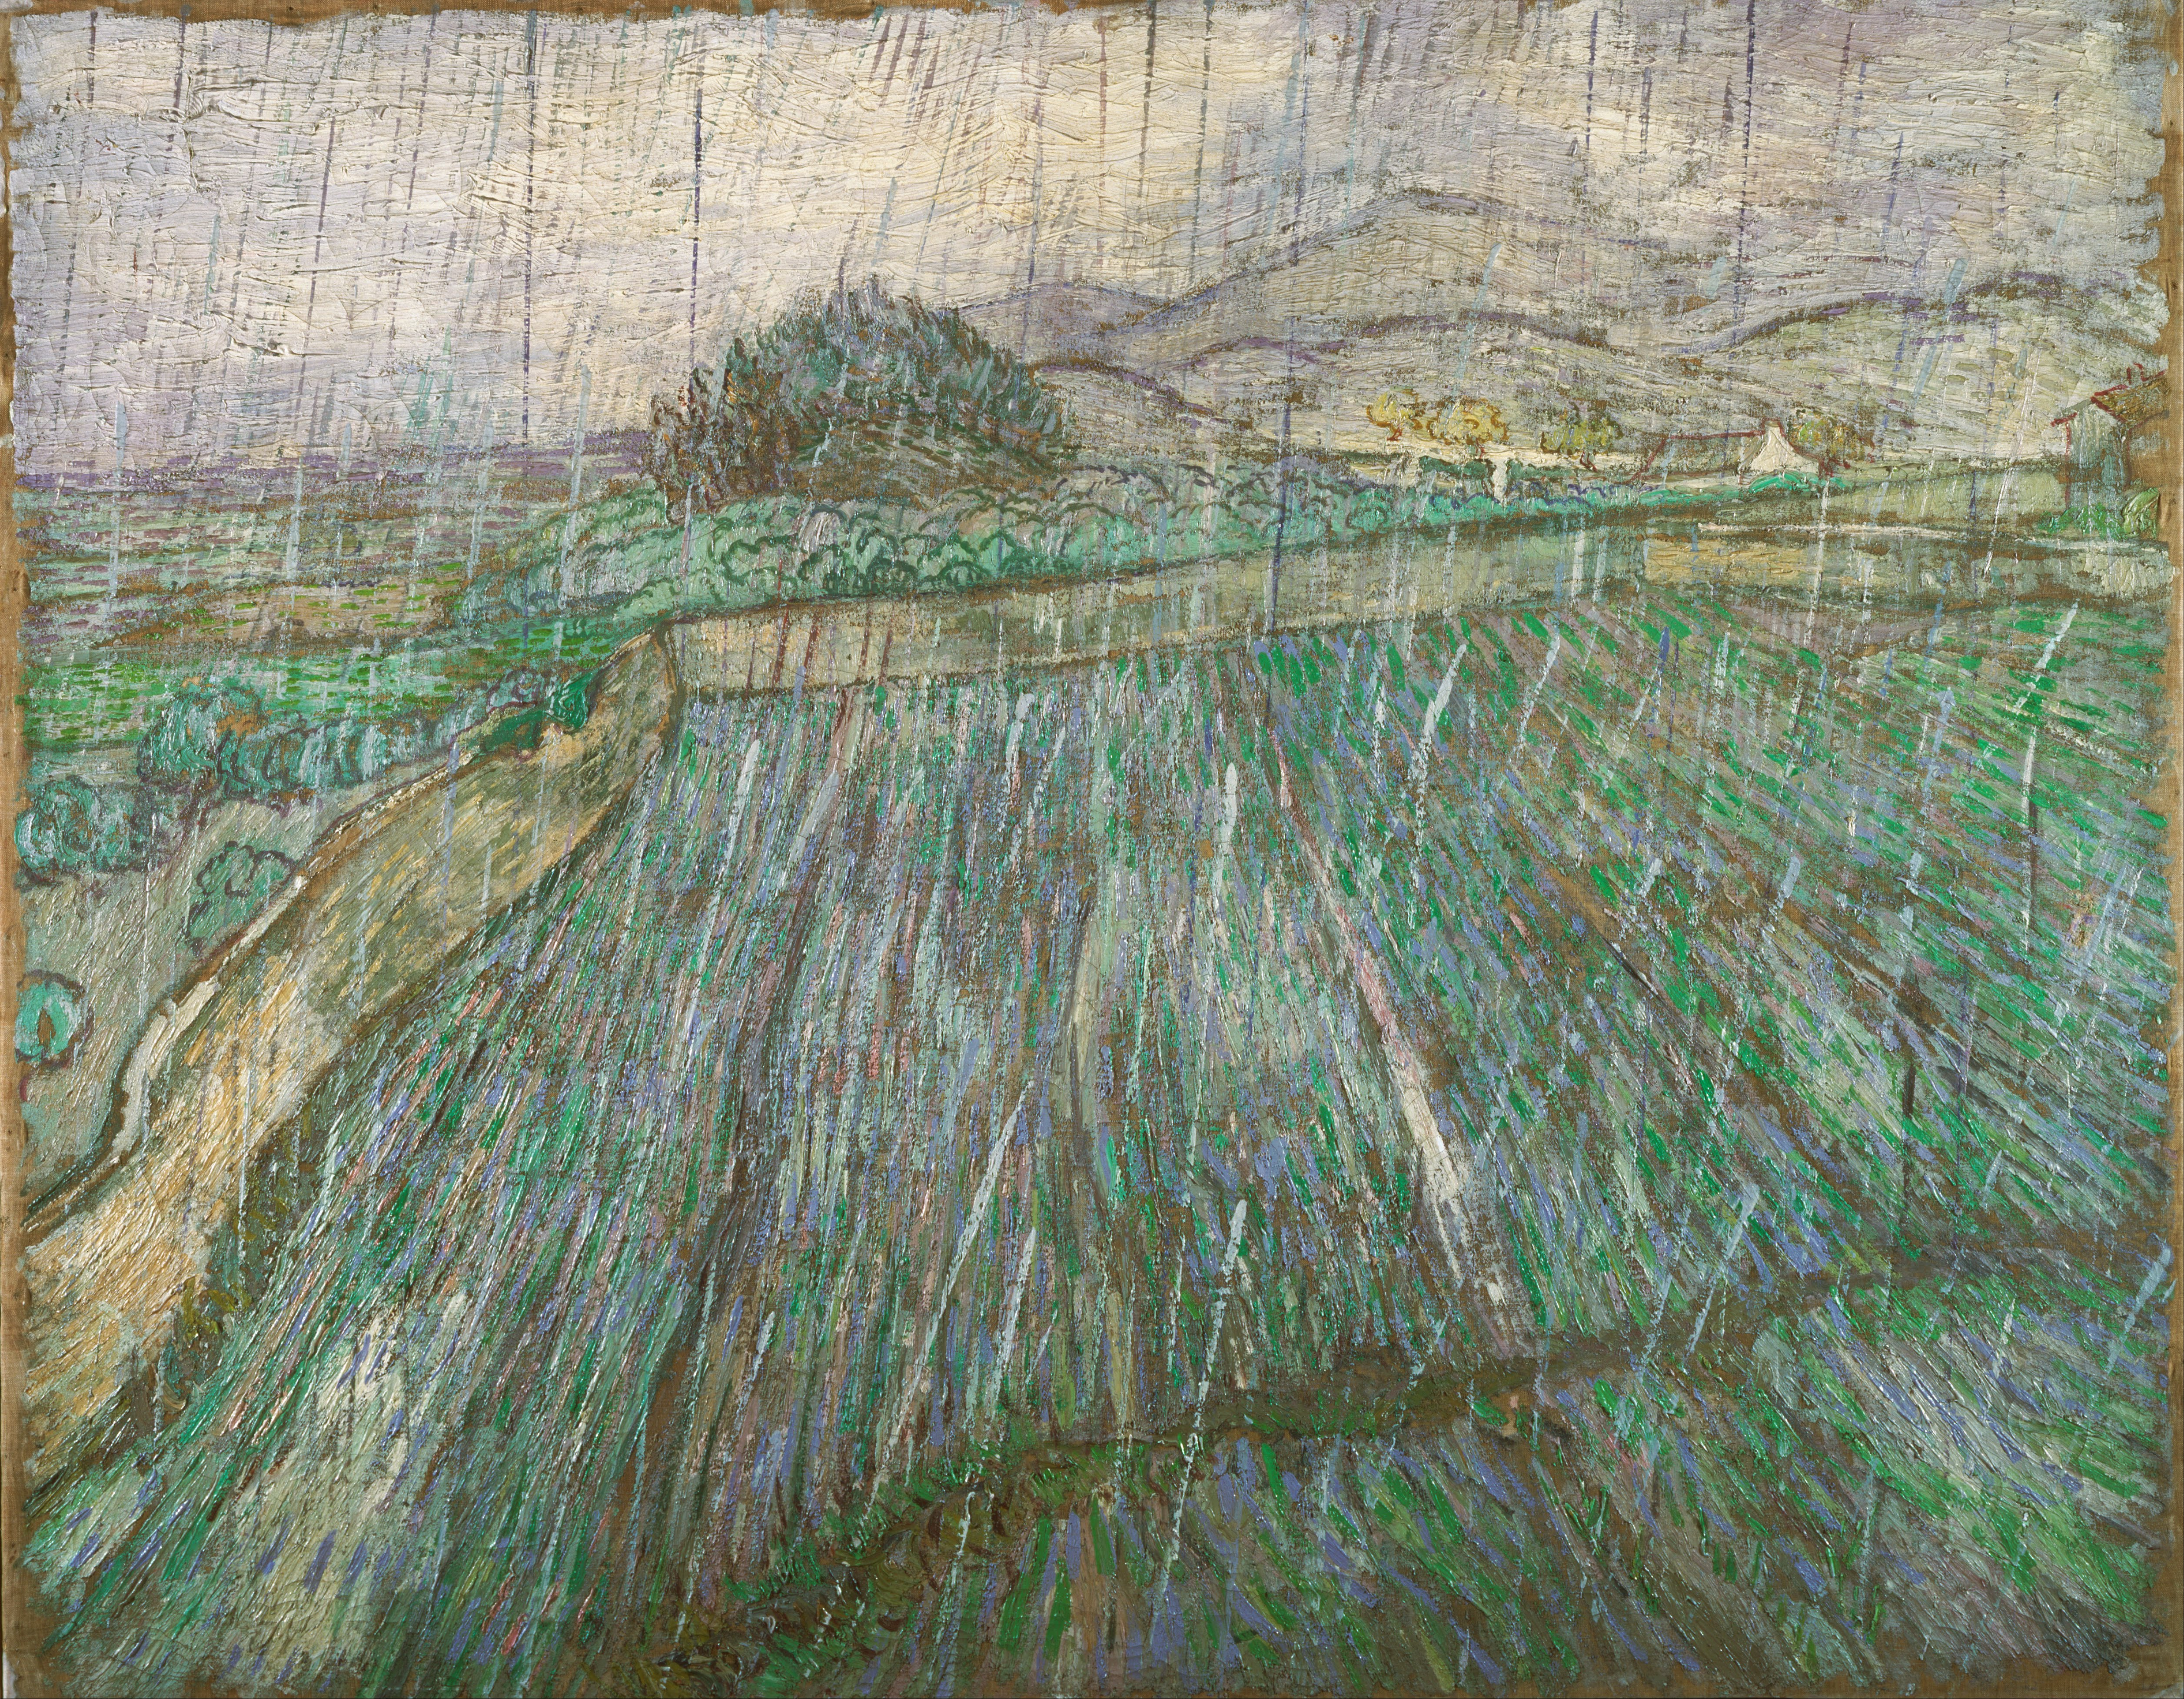 Wheat fields van gogh series wikipedia rain or enclosed wheat field in the rain november 1889 philadelphia museum of art philadelphia f650 buycottarizona Choice Image